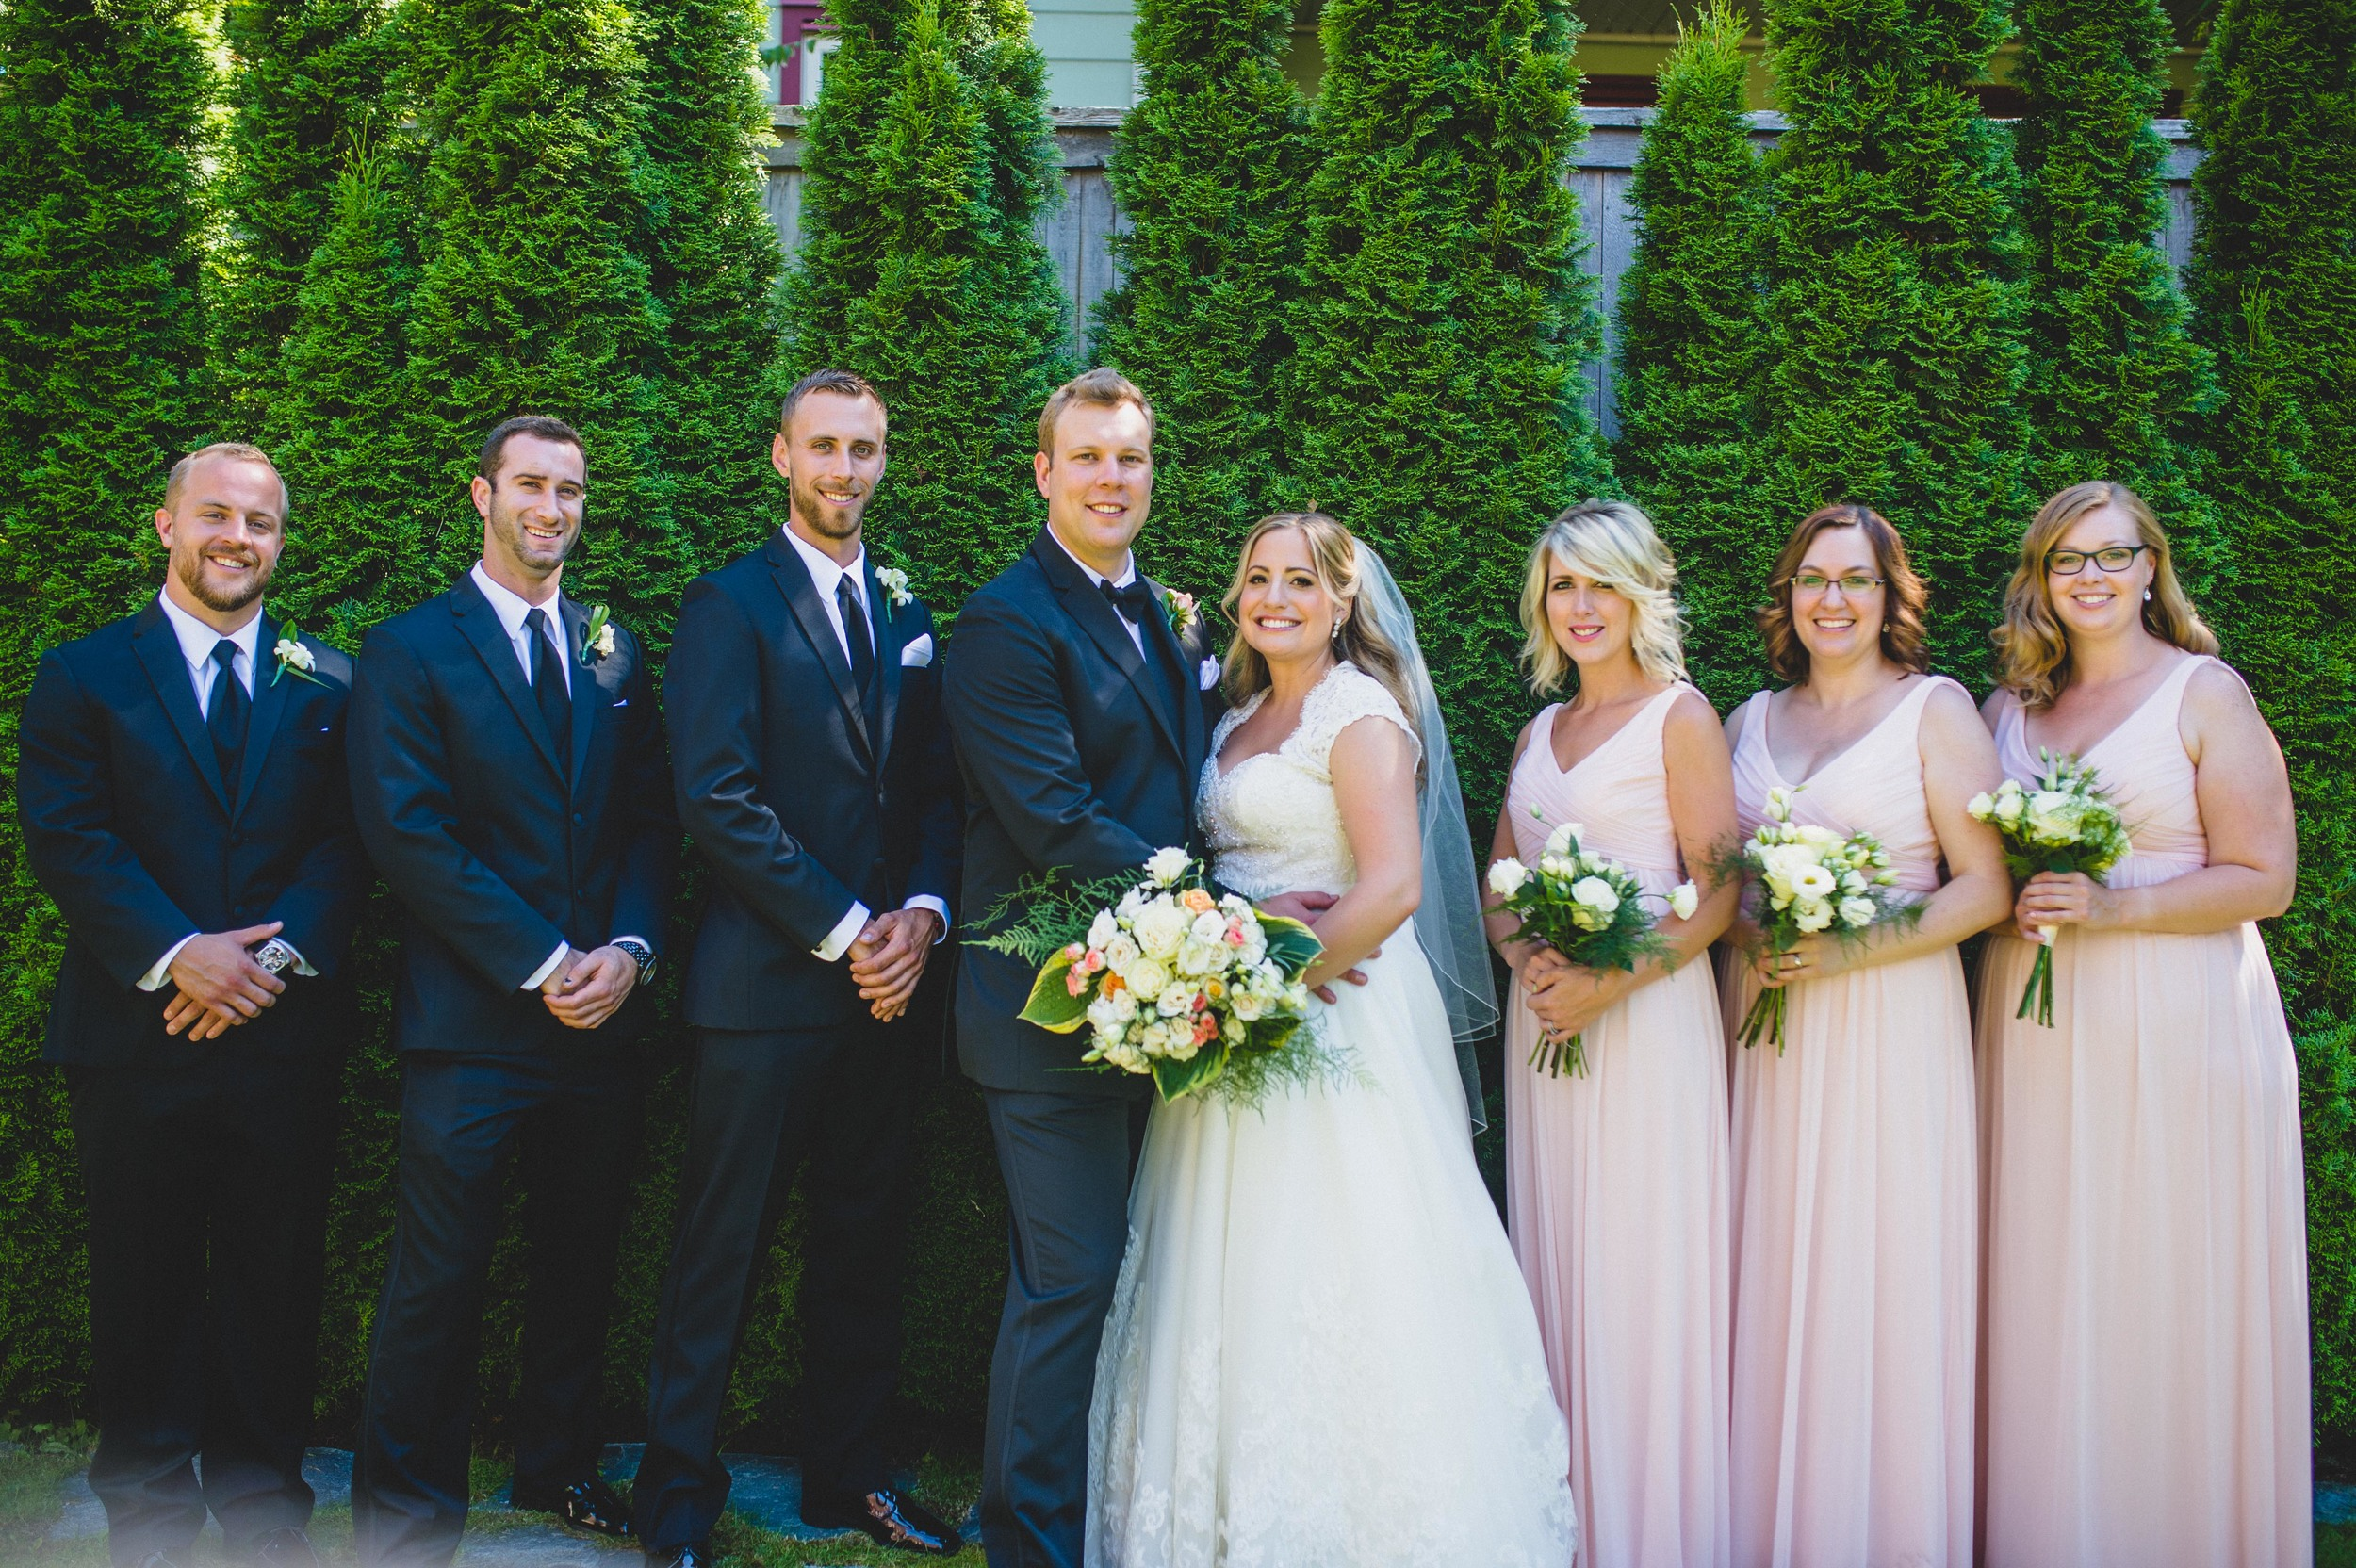 Vancouver St Augustine 's Church wedding photographer edward lai photography-57.jpg